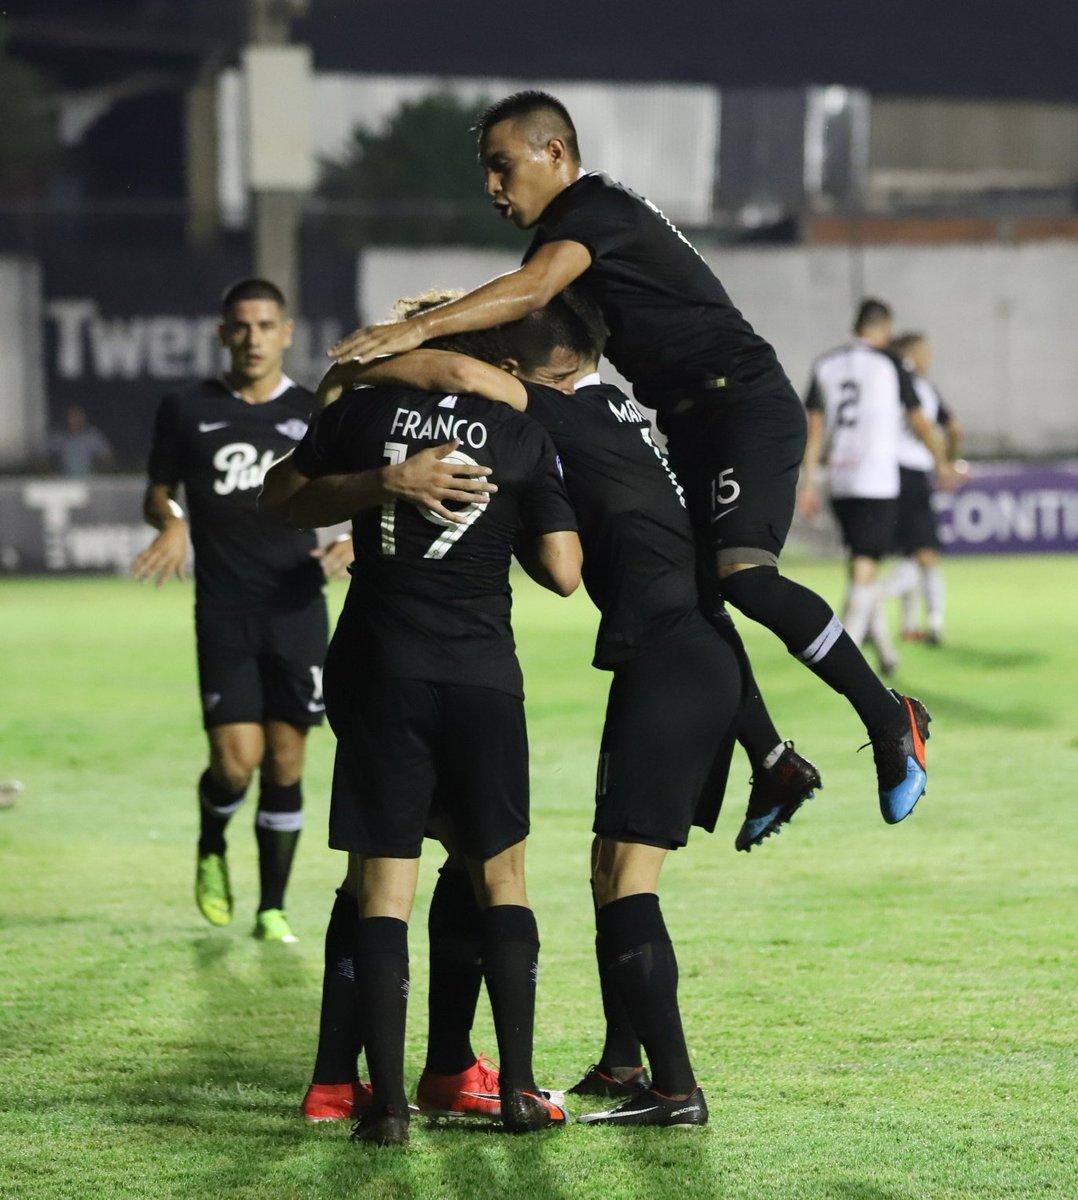 Club Libertad's photo on Benitez